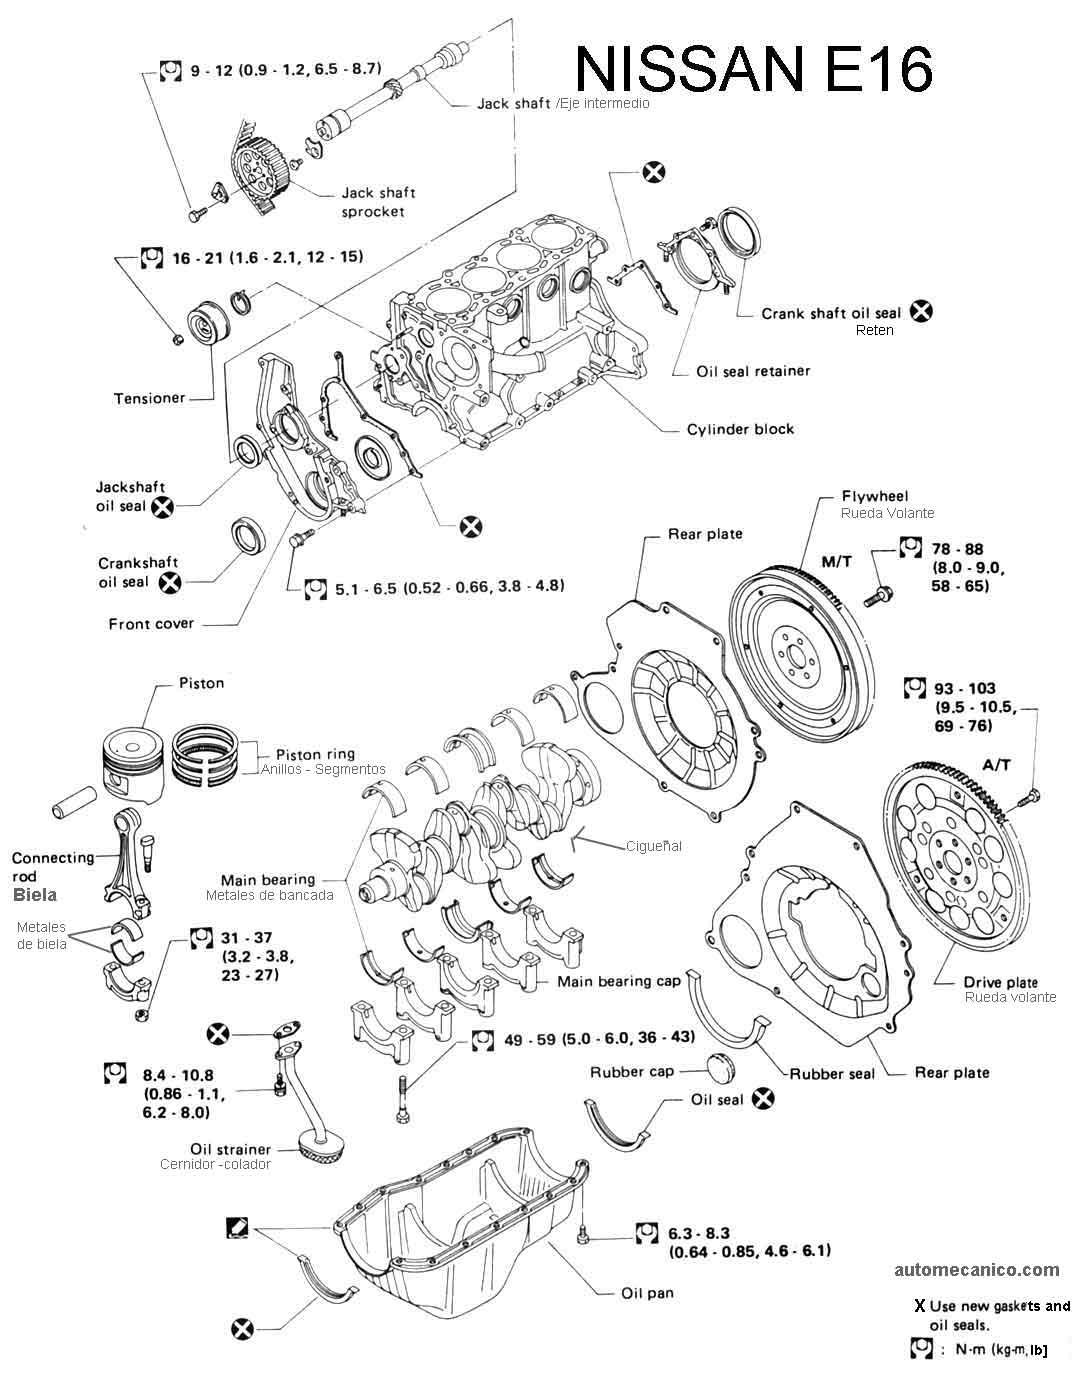 Partes De Un Motor De Auto Nissan